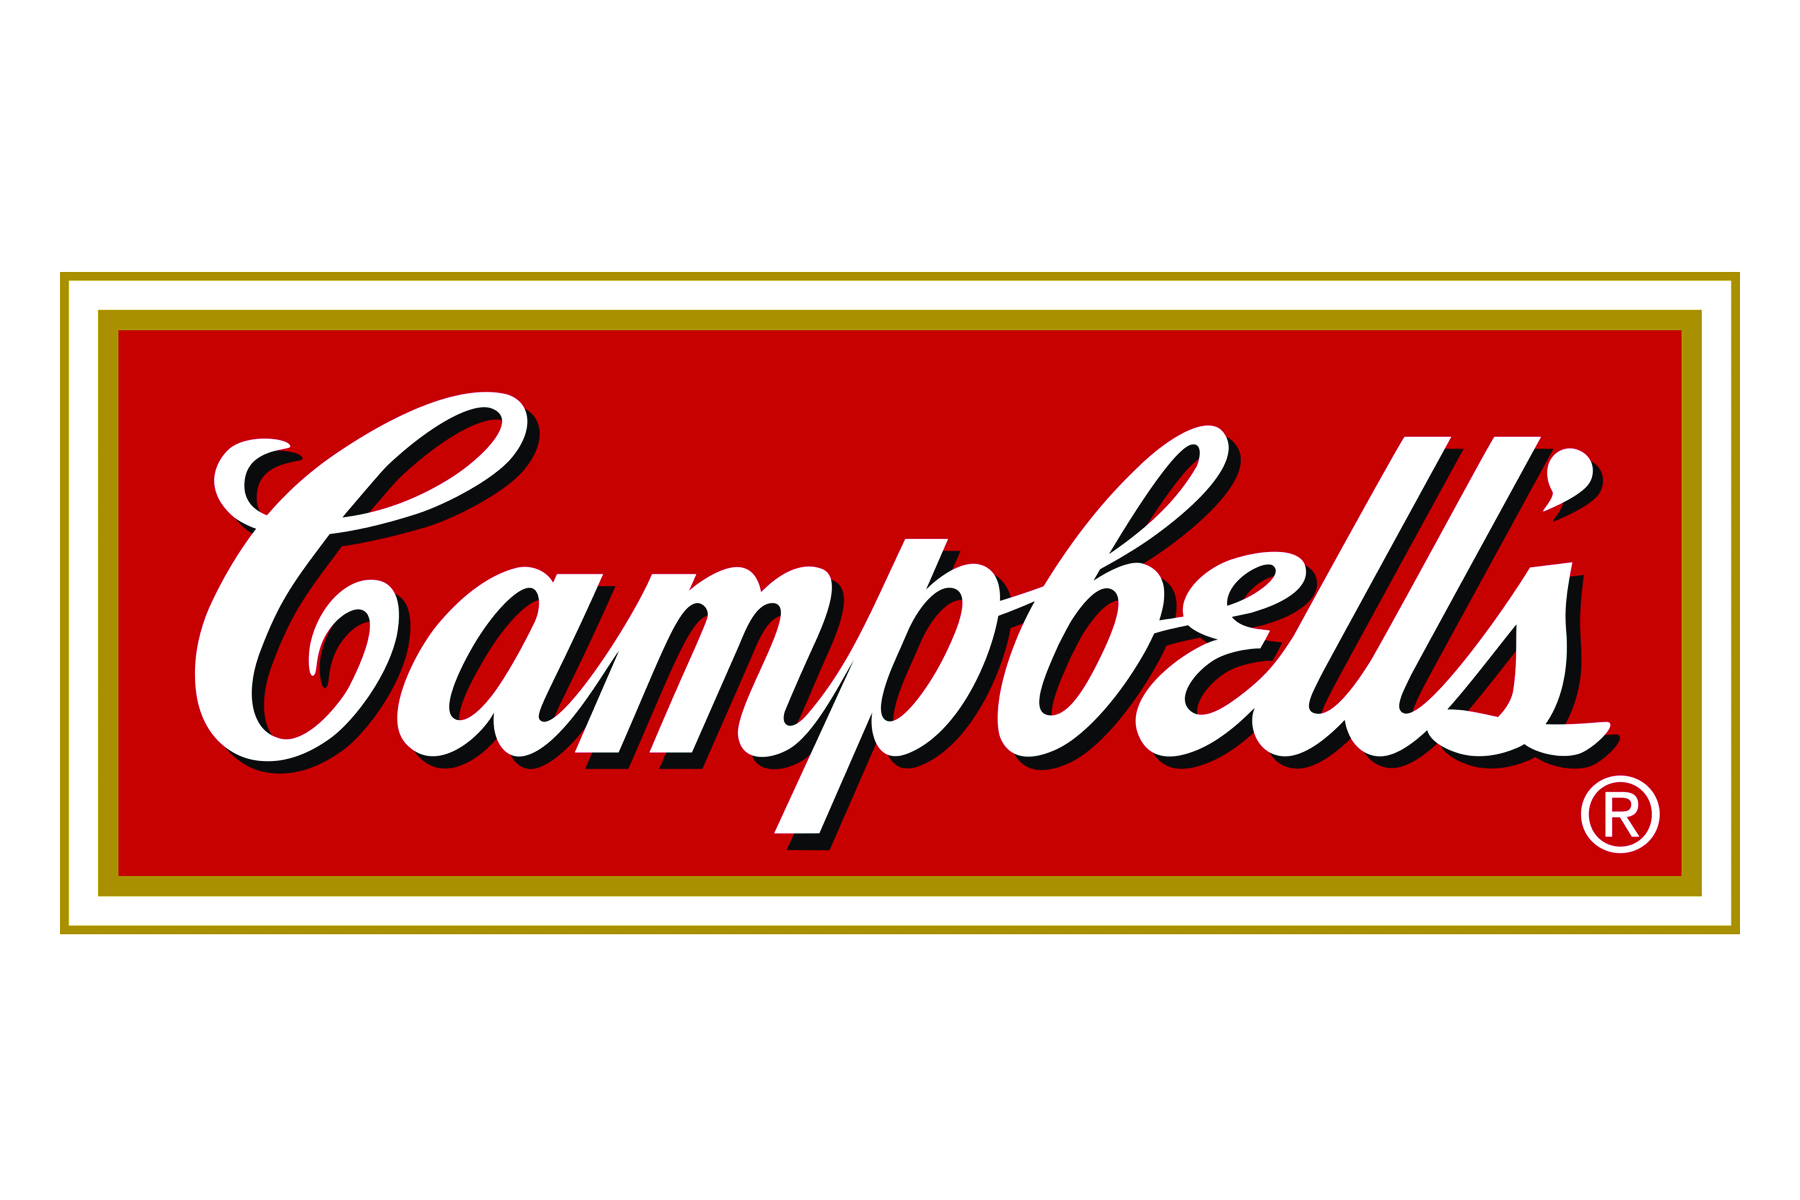 CAMPLBELLS_LOGO_SITE.jpg